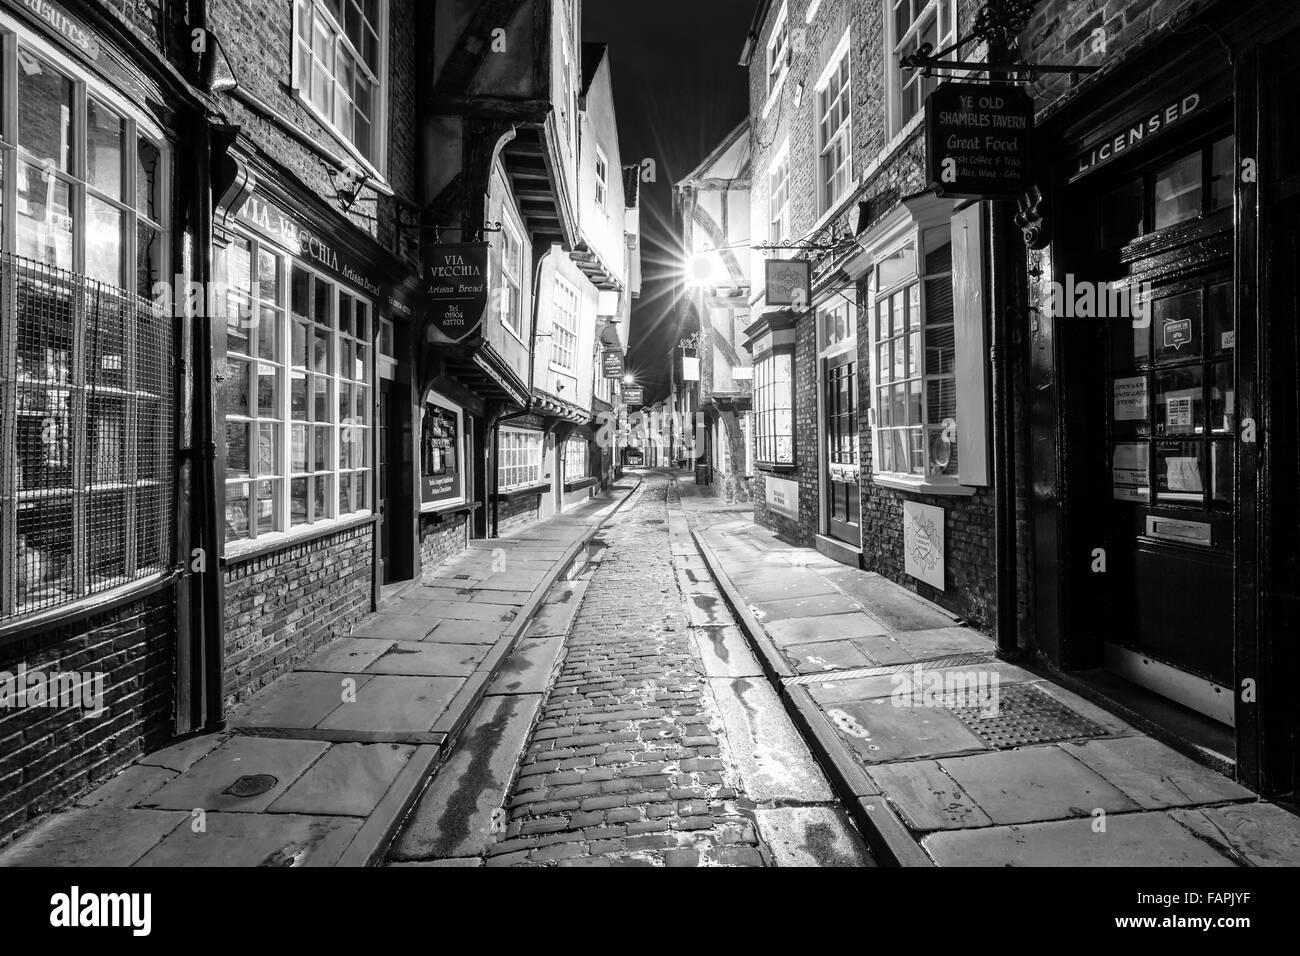 The Shambles, York City Centre - Stock Image